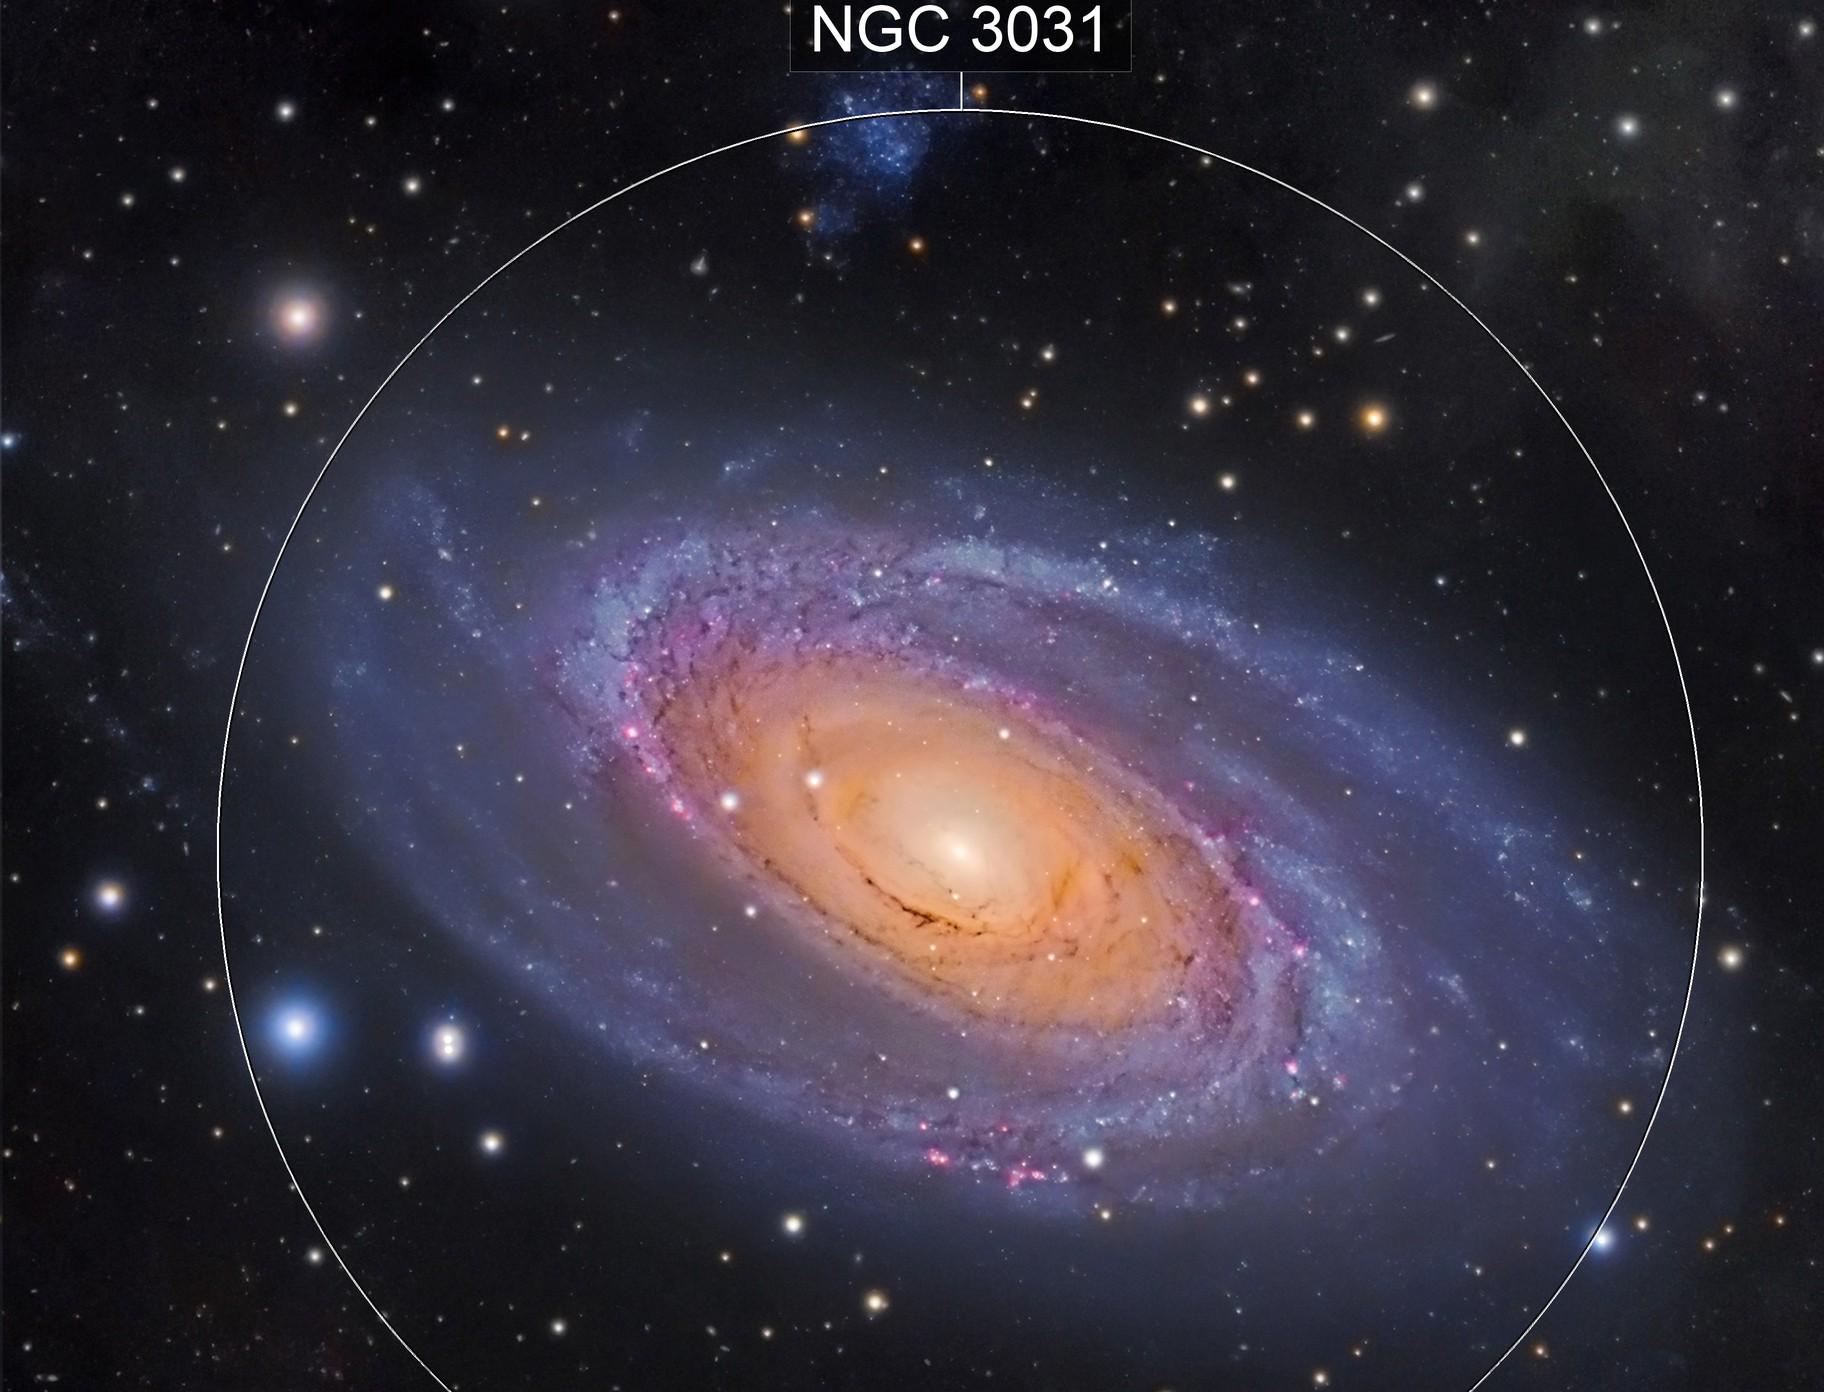 A Jewel in the night sky - M81